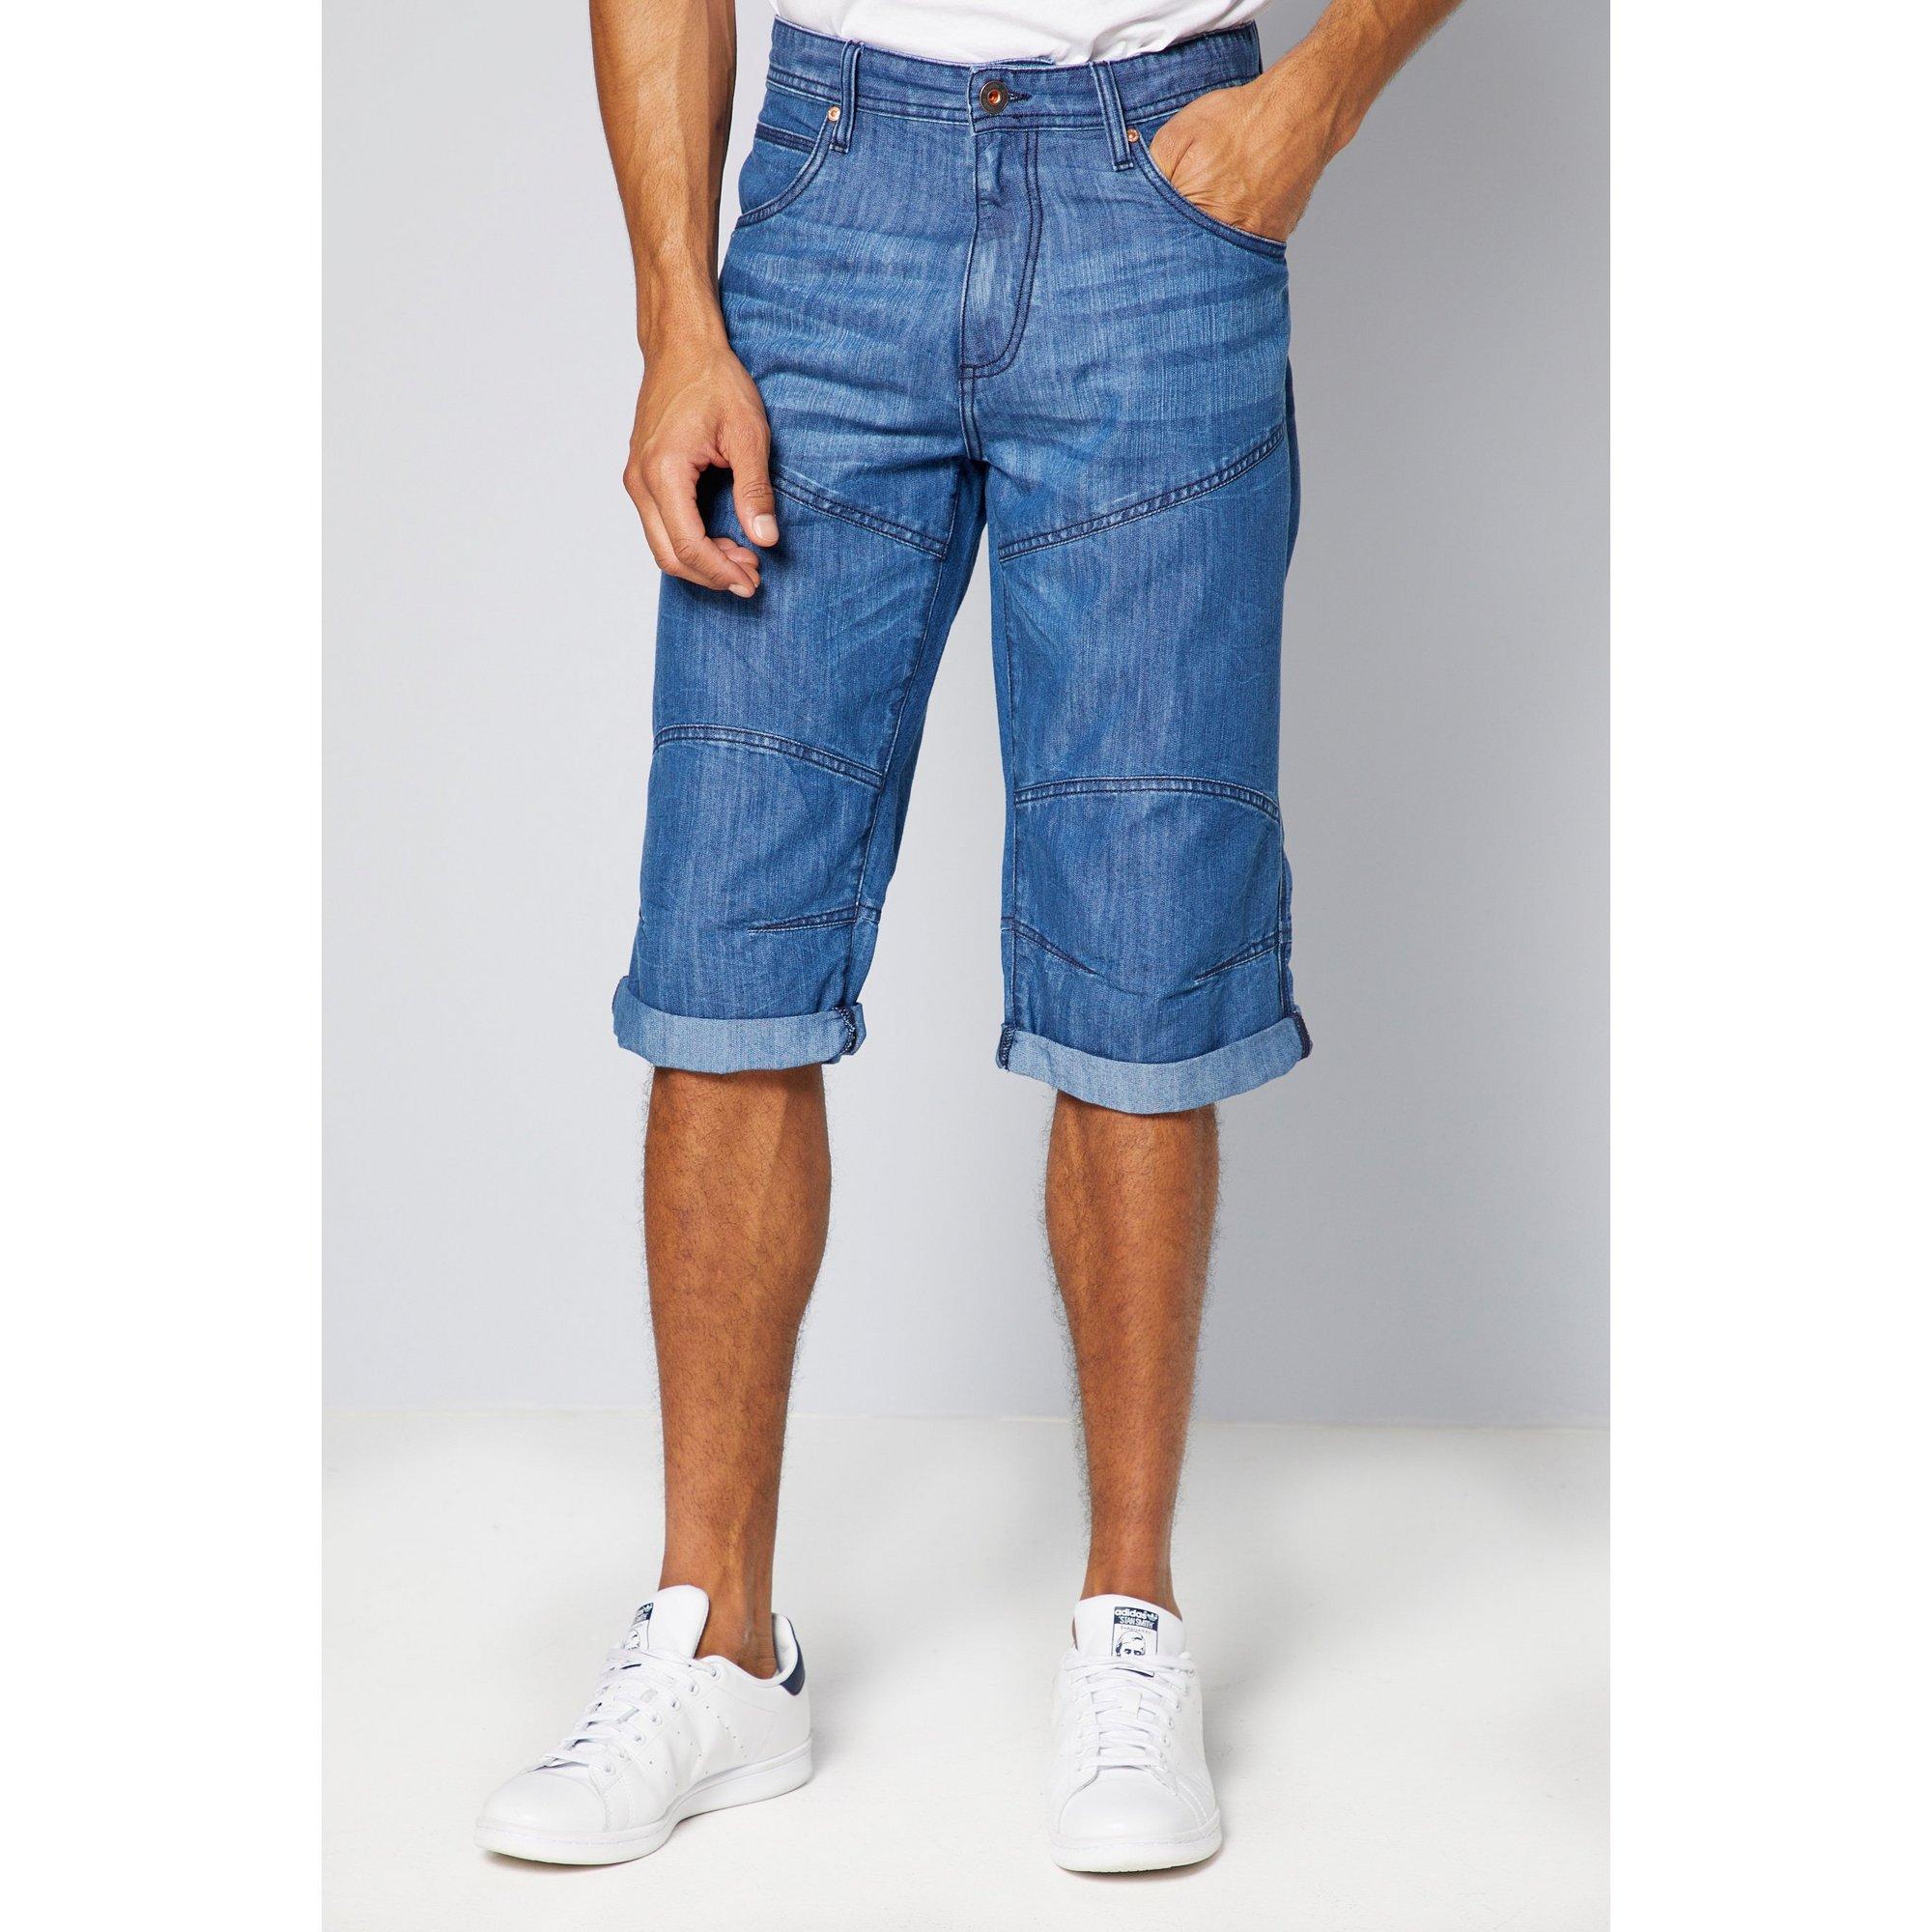 Image of 3/4 Long Denim Shorts